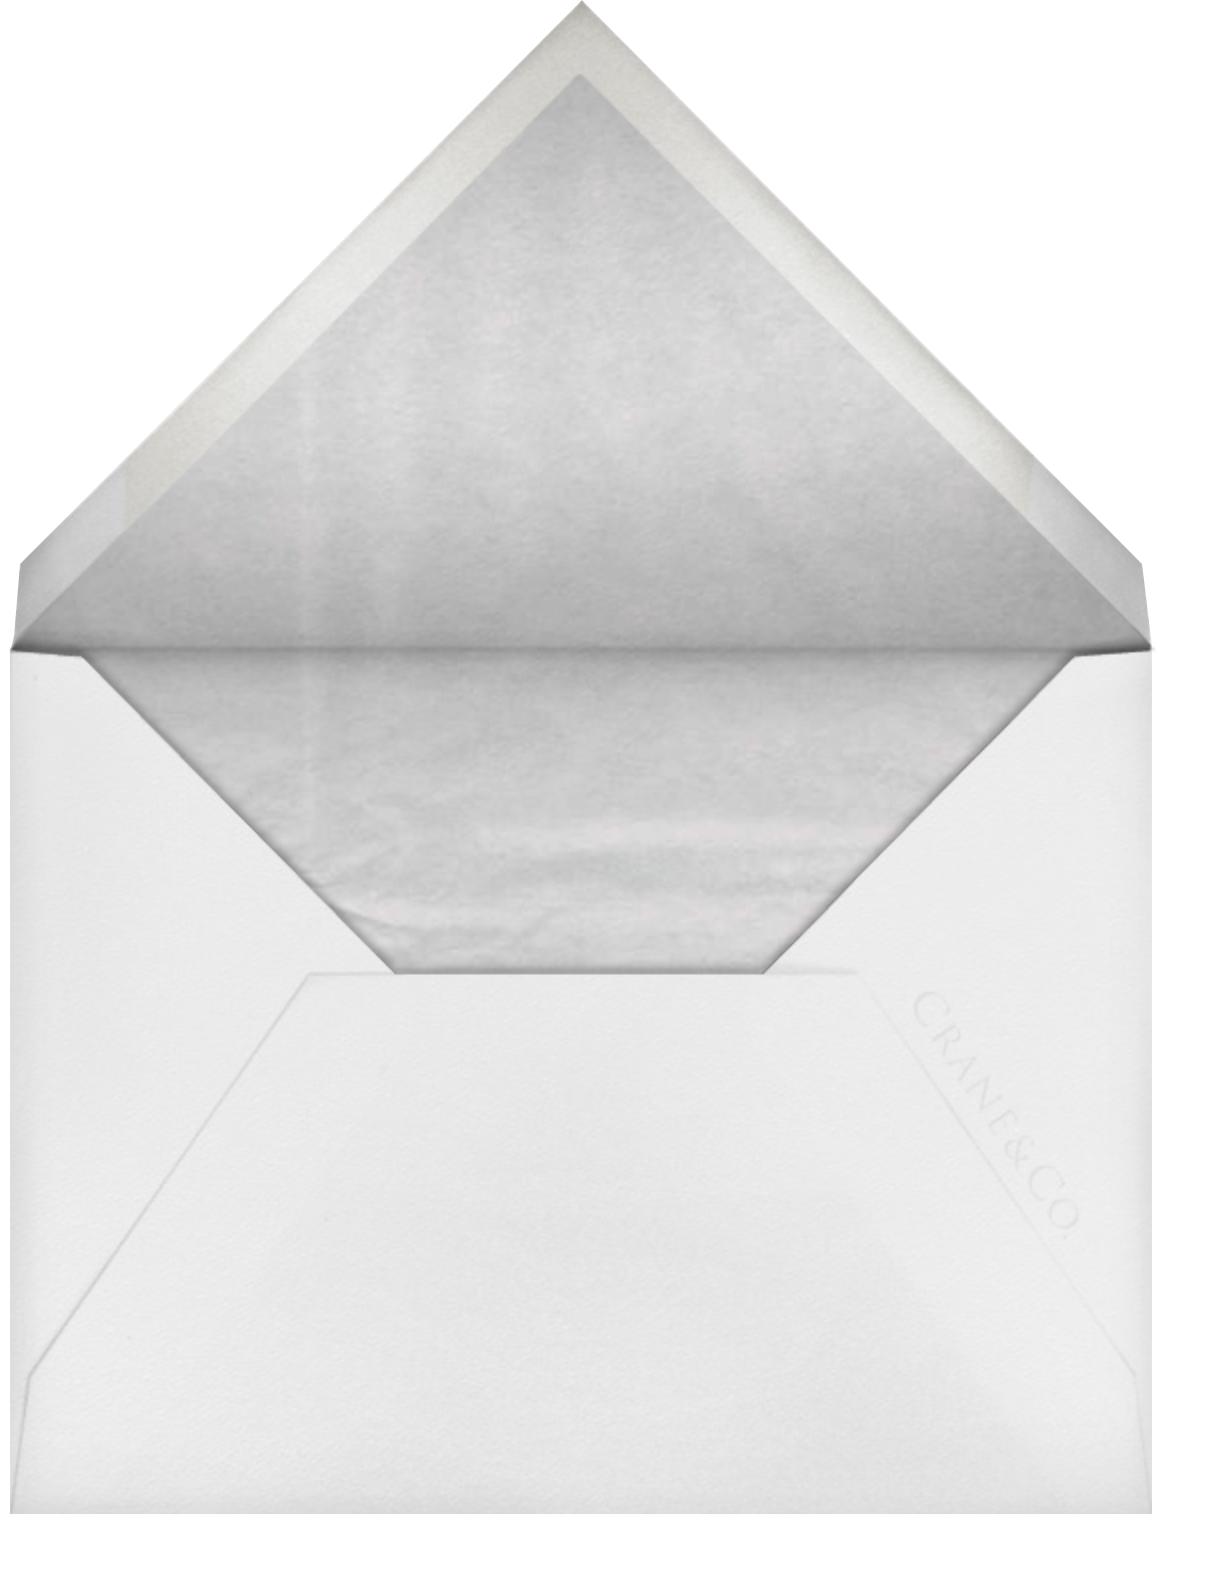 Splatter Cloth I (Stationery) - Platinum - Paperless Post - Personalized stationery - envelope back